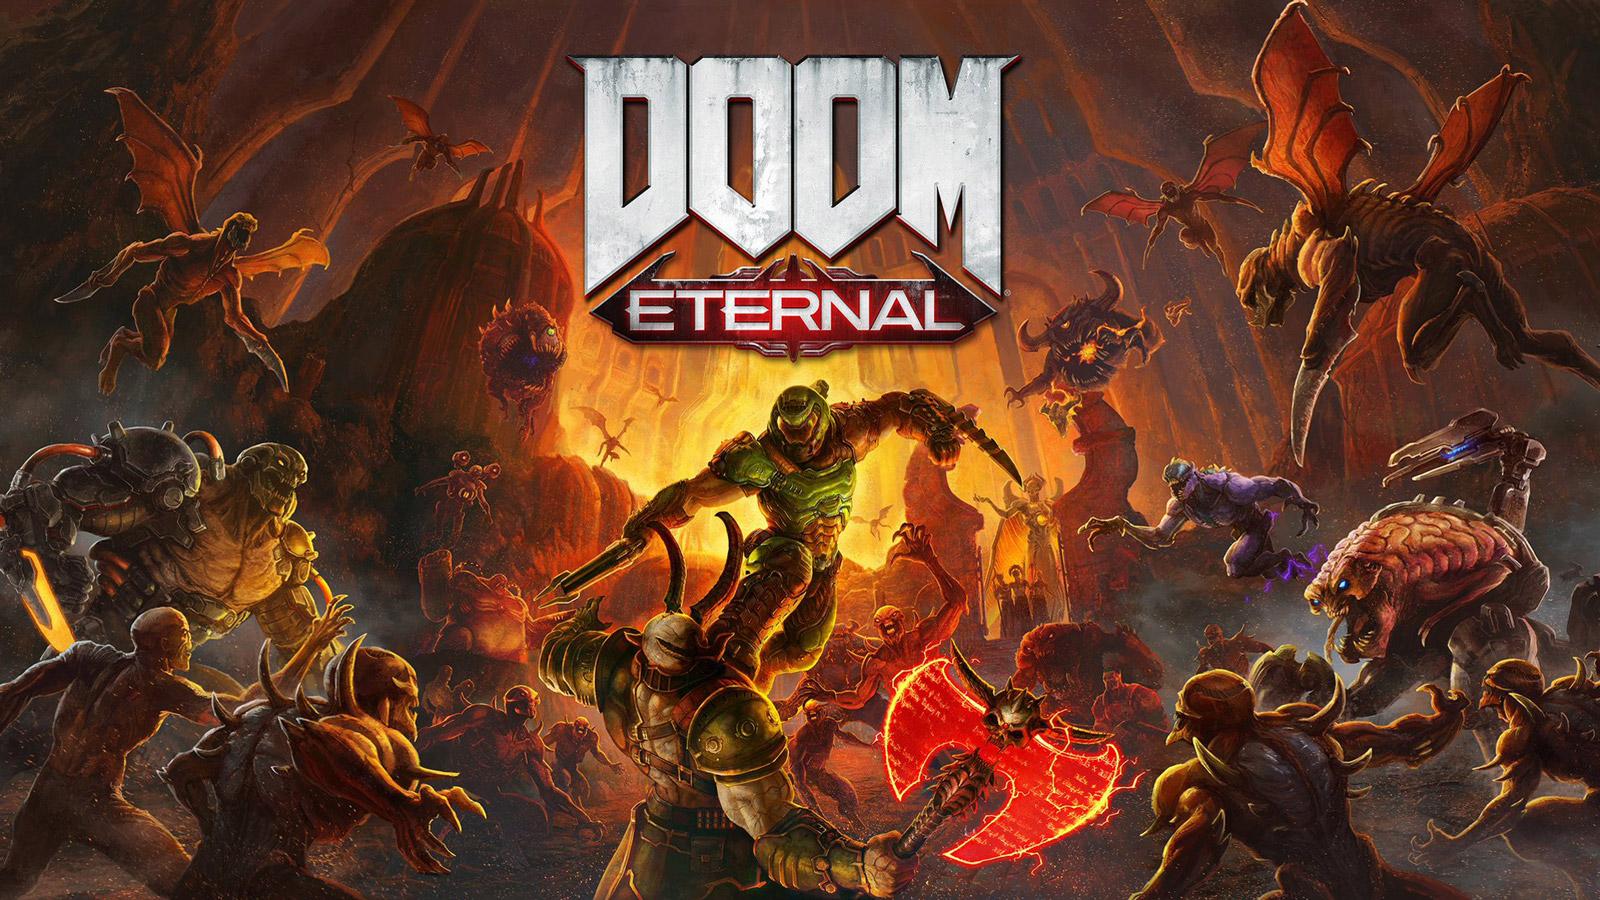 Free Doom Eternal Wallpaper in 1600x900